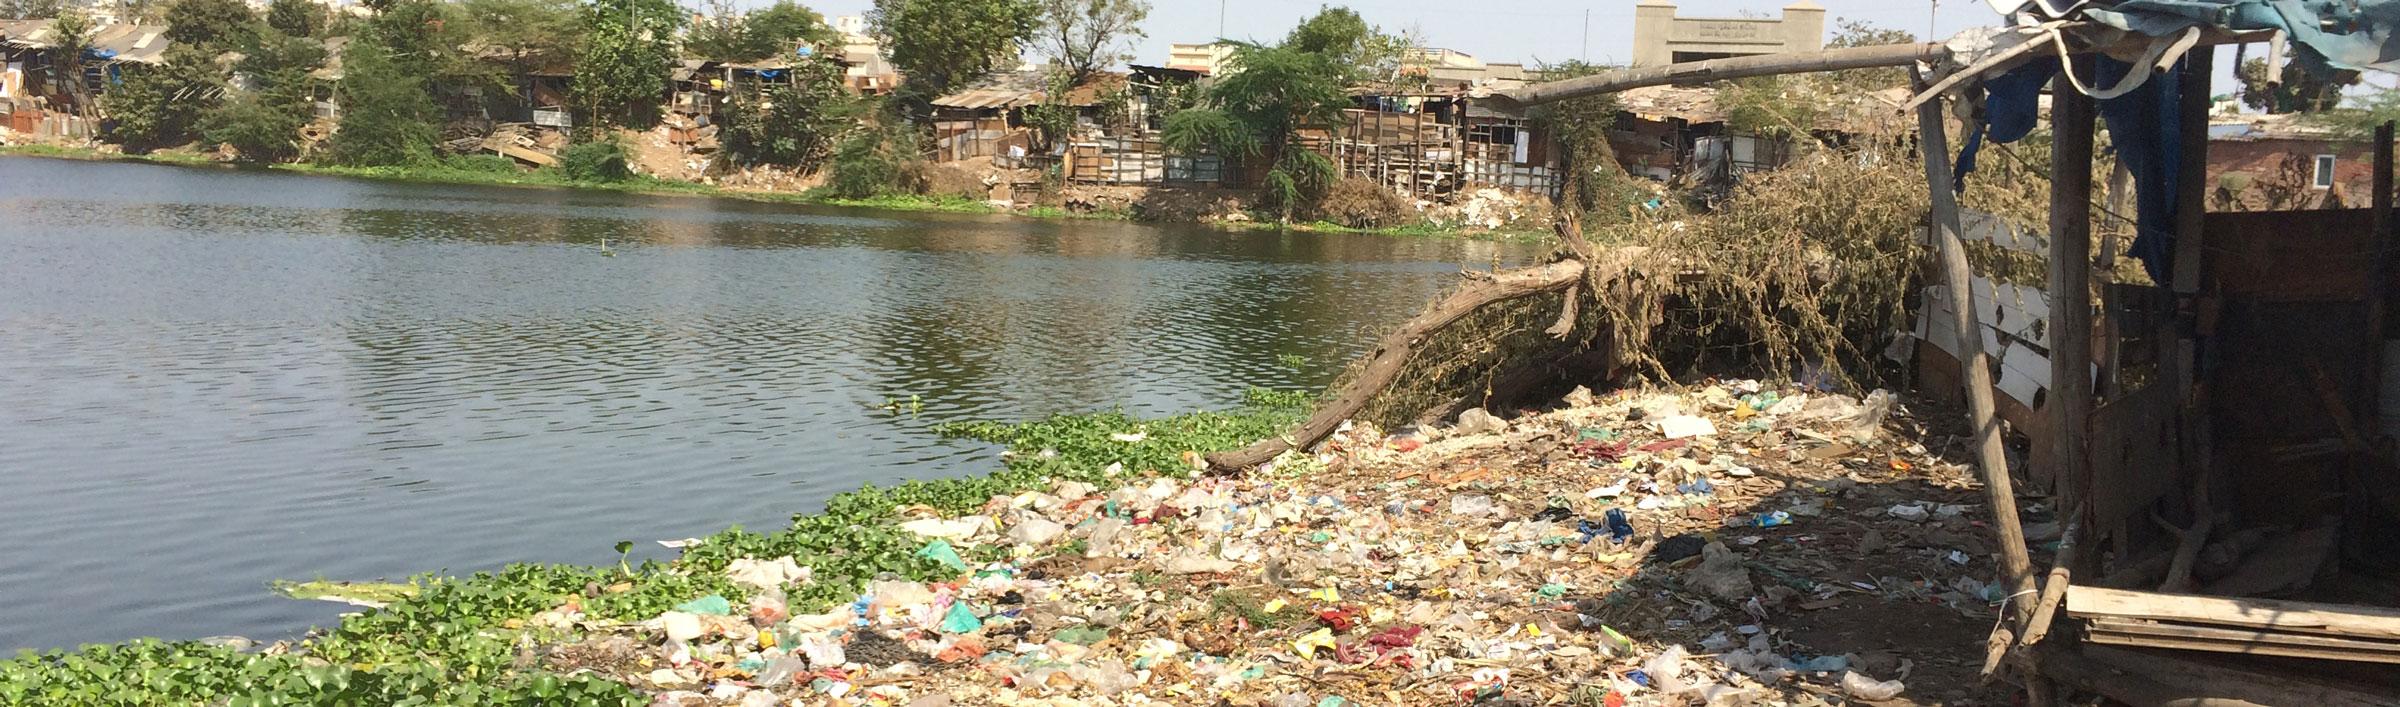 sanitation crisis